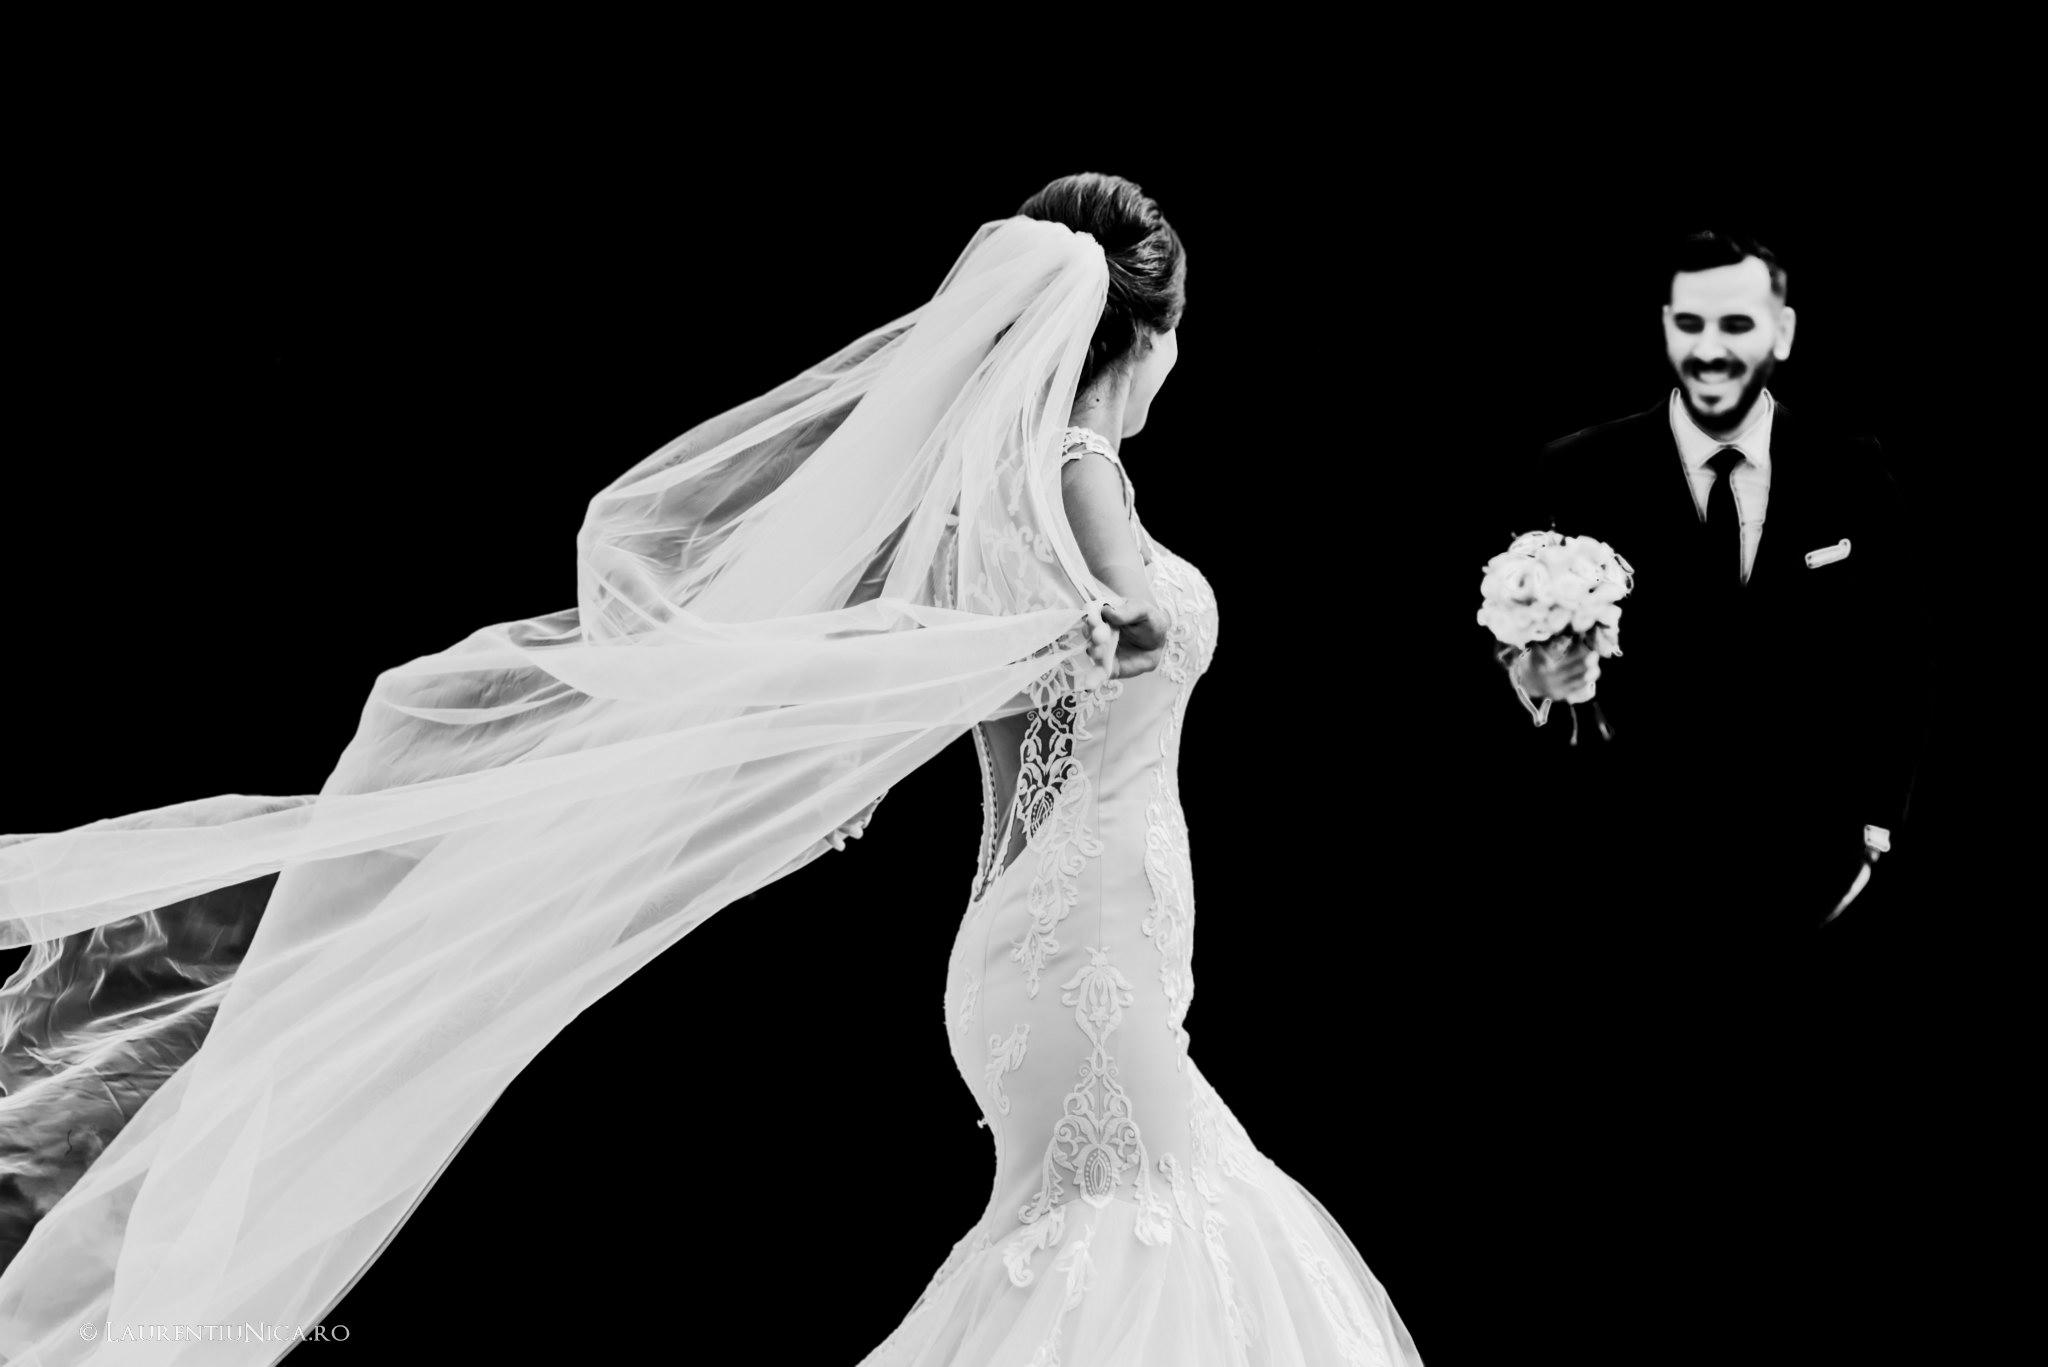 andreea si alin fotografii after wedding balchik bulgaria05 - Andreea & Alin | Fotografii After Wedding | Balchik Bulgaria